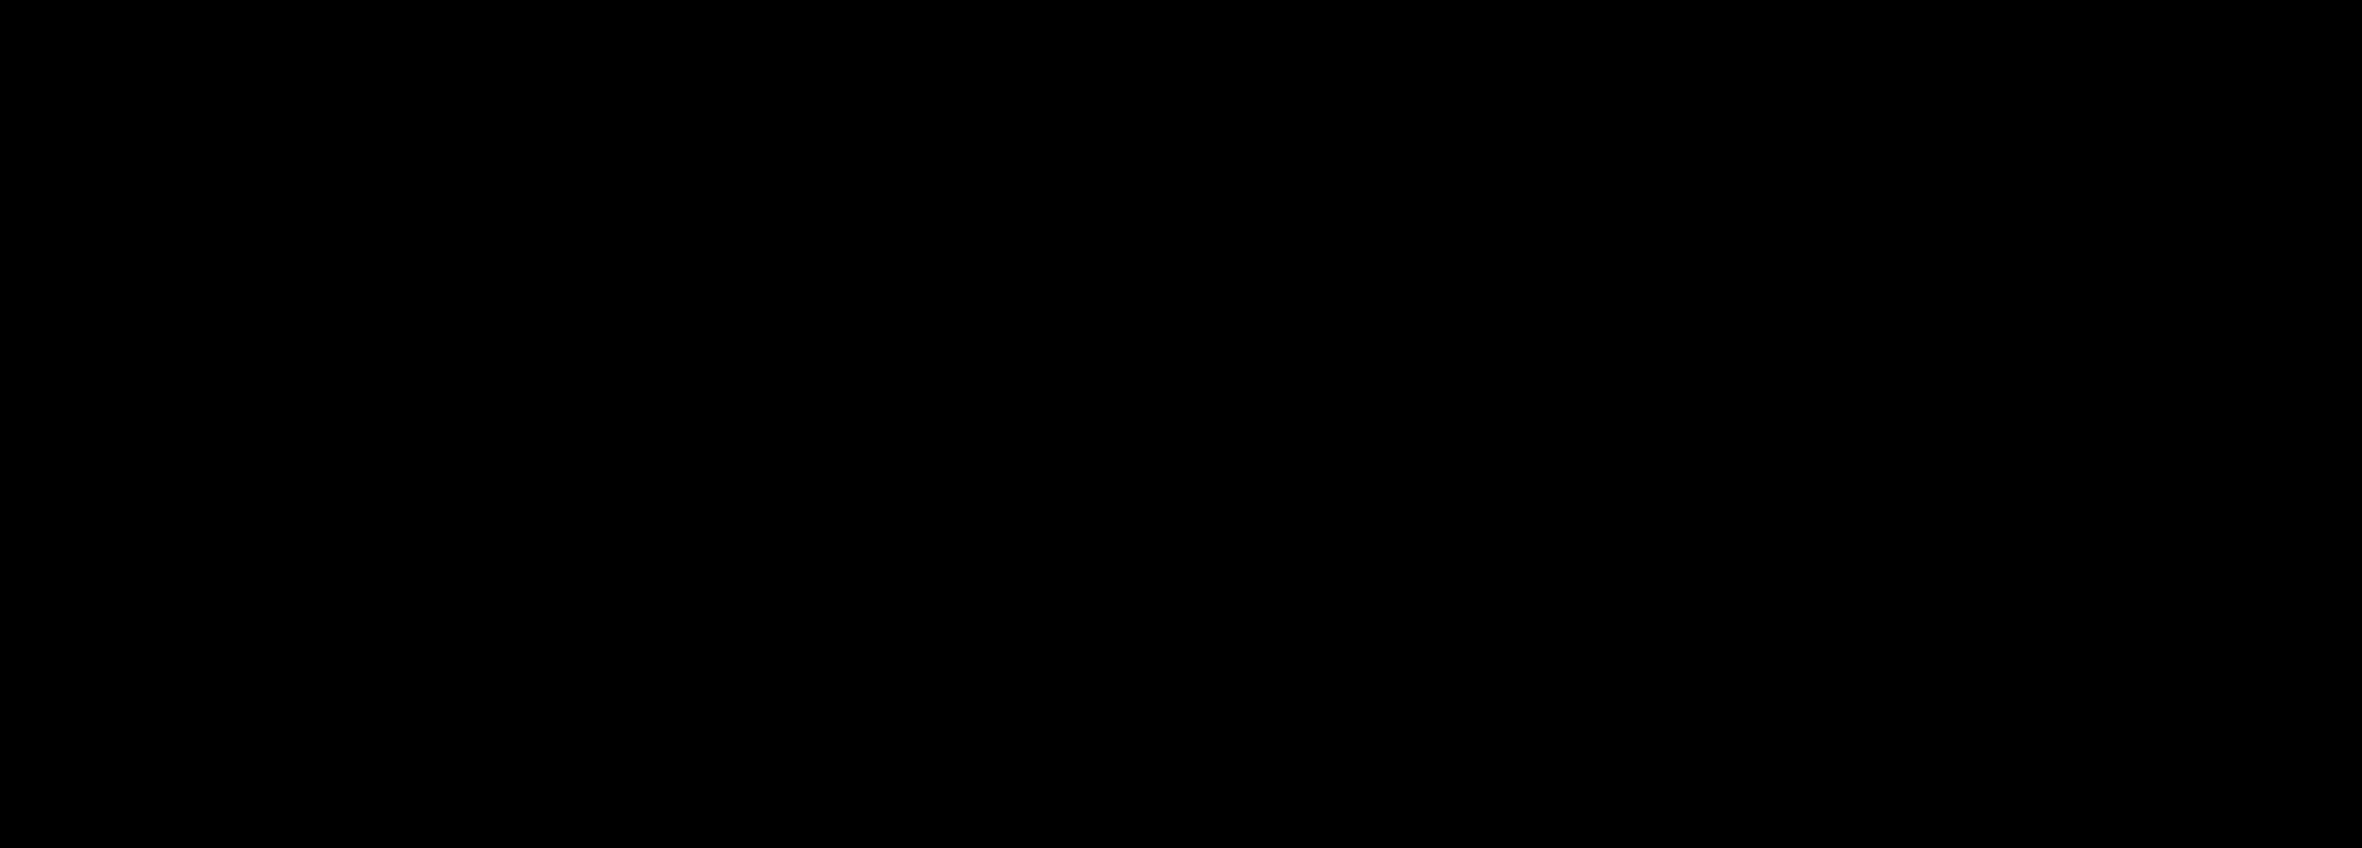 Schreinerei-Lingenhag